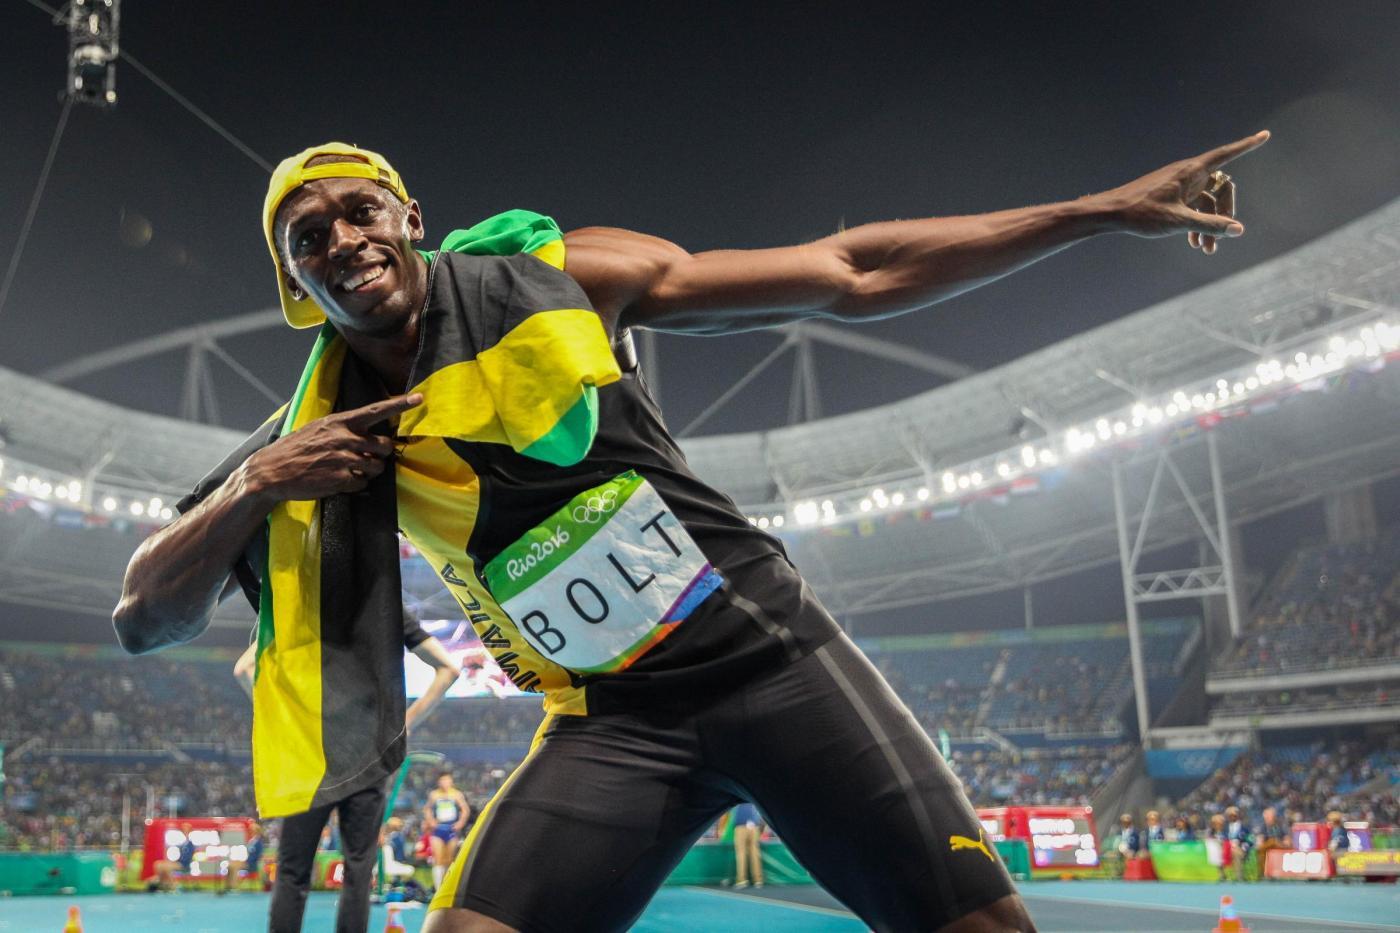 Olimpiadi 2016, Usain Bolt vince ancora l'oro olimpico nei 100 metri